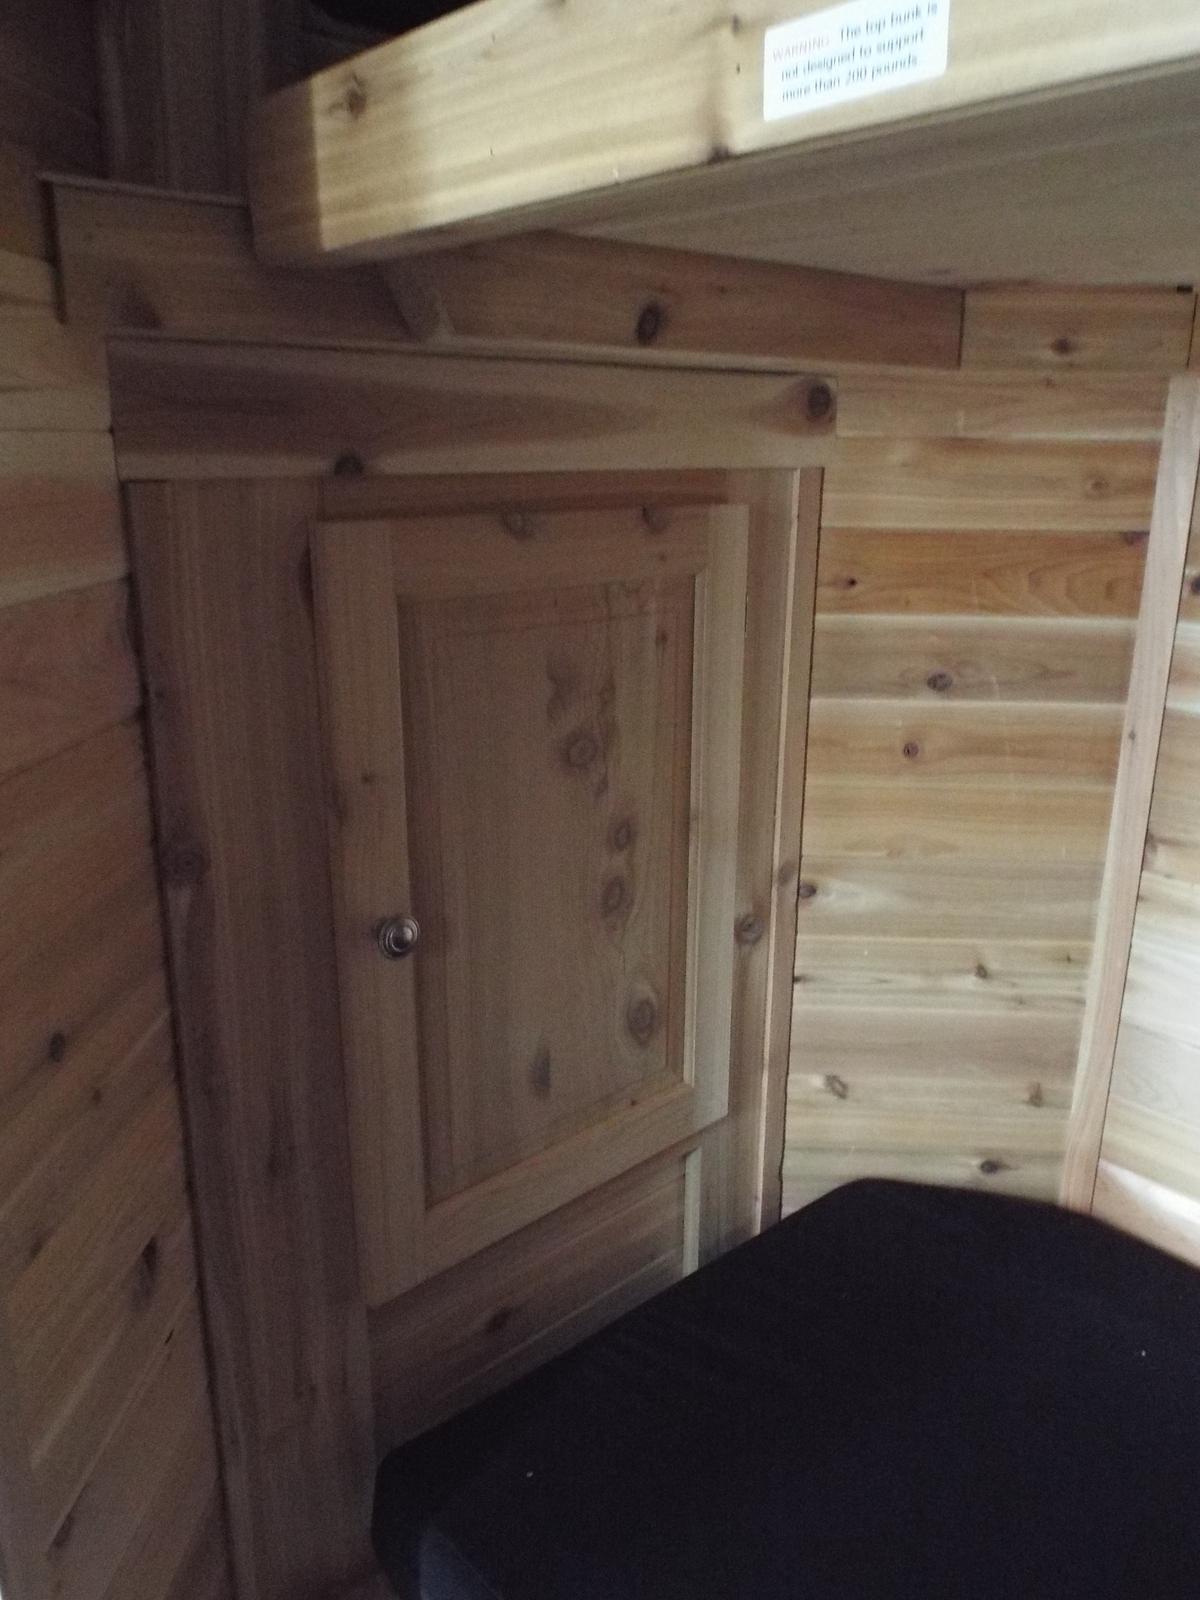 2017 ice castle 8x16v stinger for sale in watertown, sd | doug's